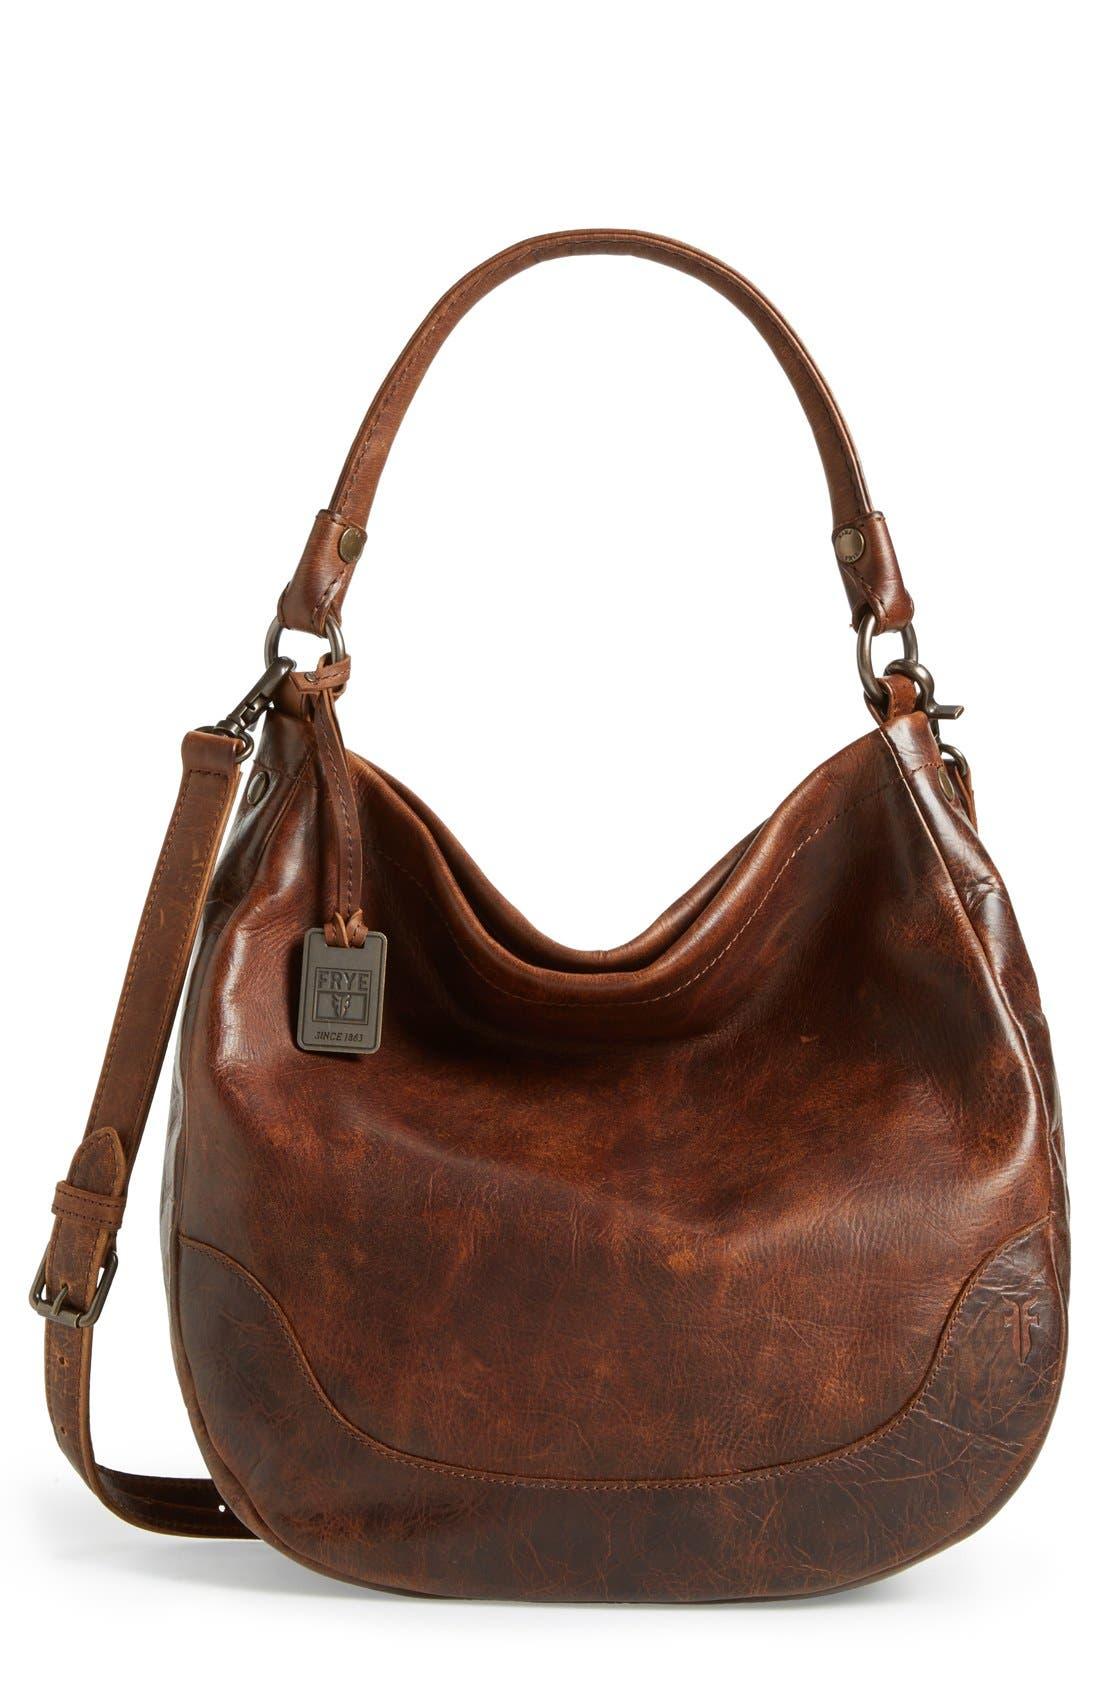 a2b3dd274a4a Hobo Bags & Purses | Nordstrom